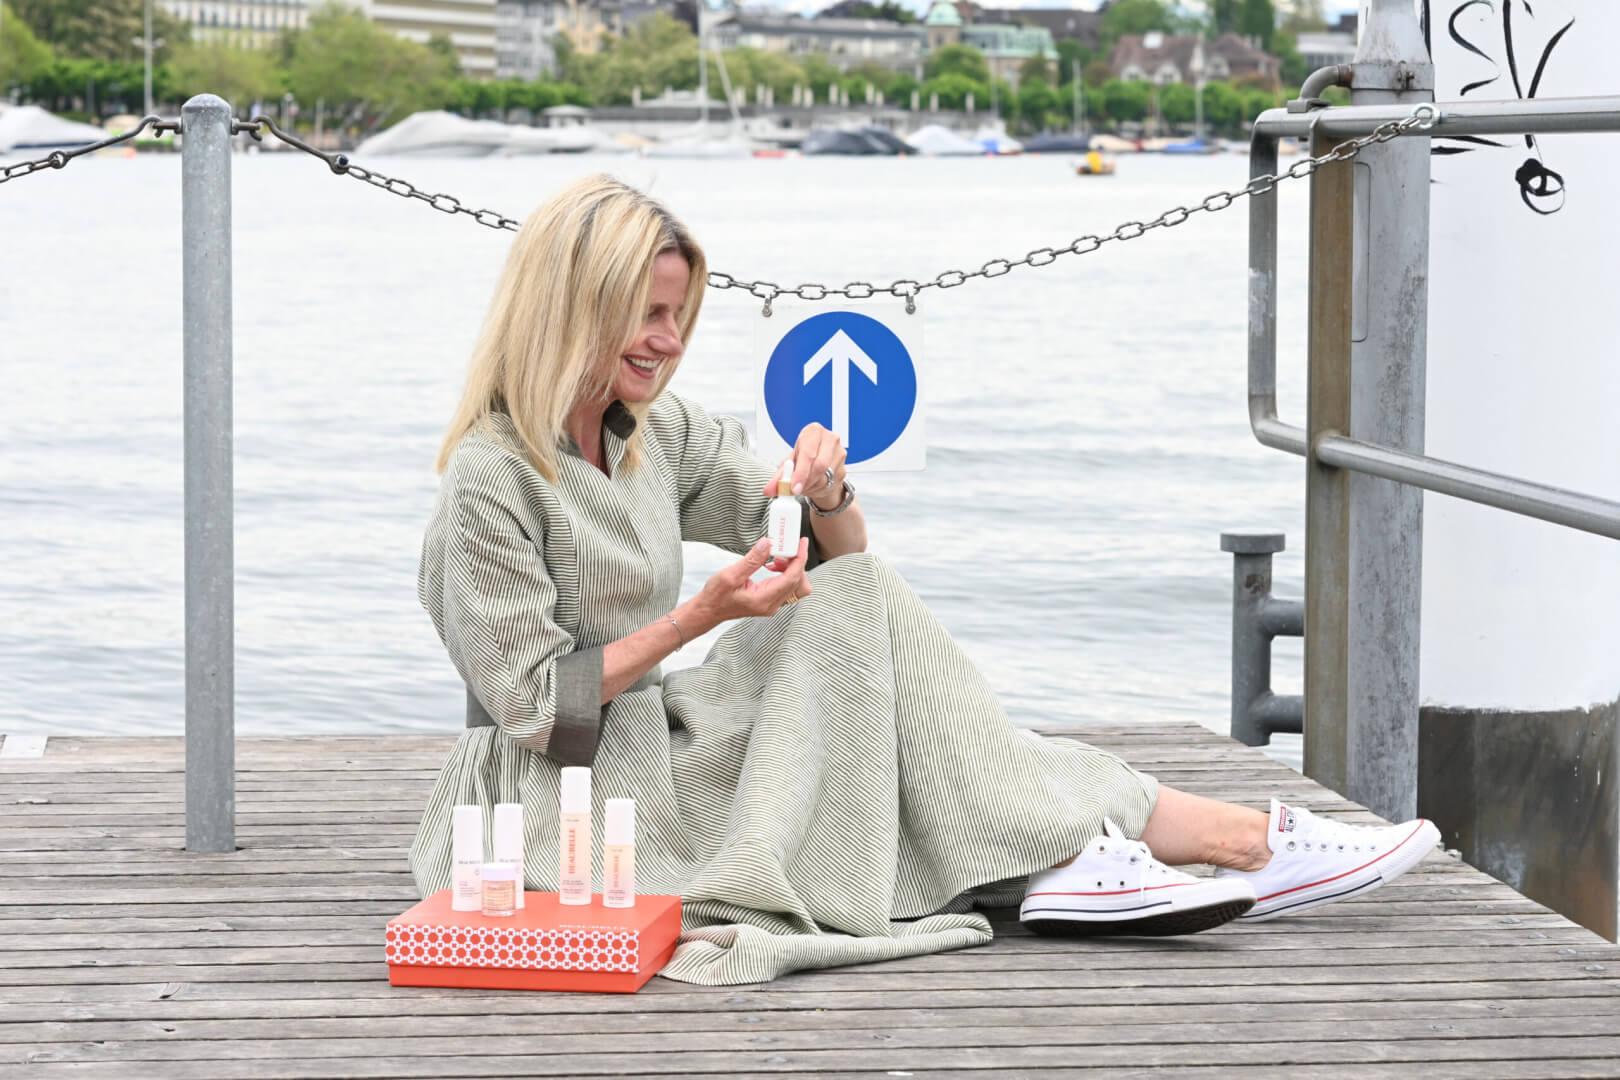 My Daily De-stressing Secret - a Swiss Rejuvenating Oil